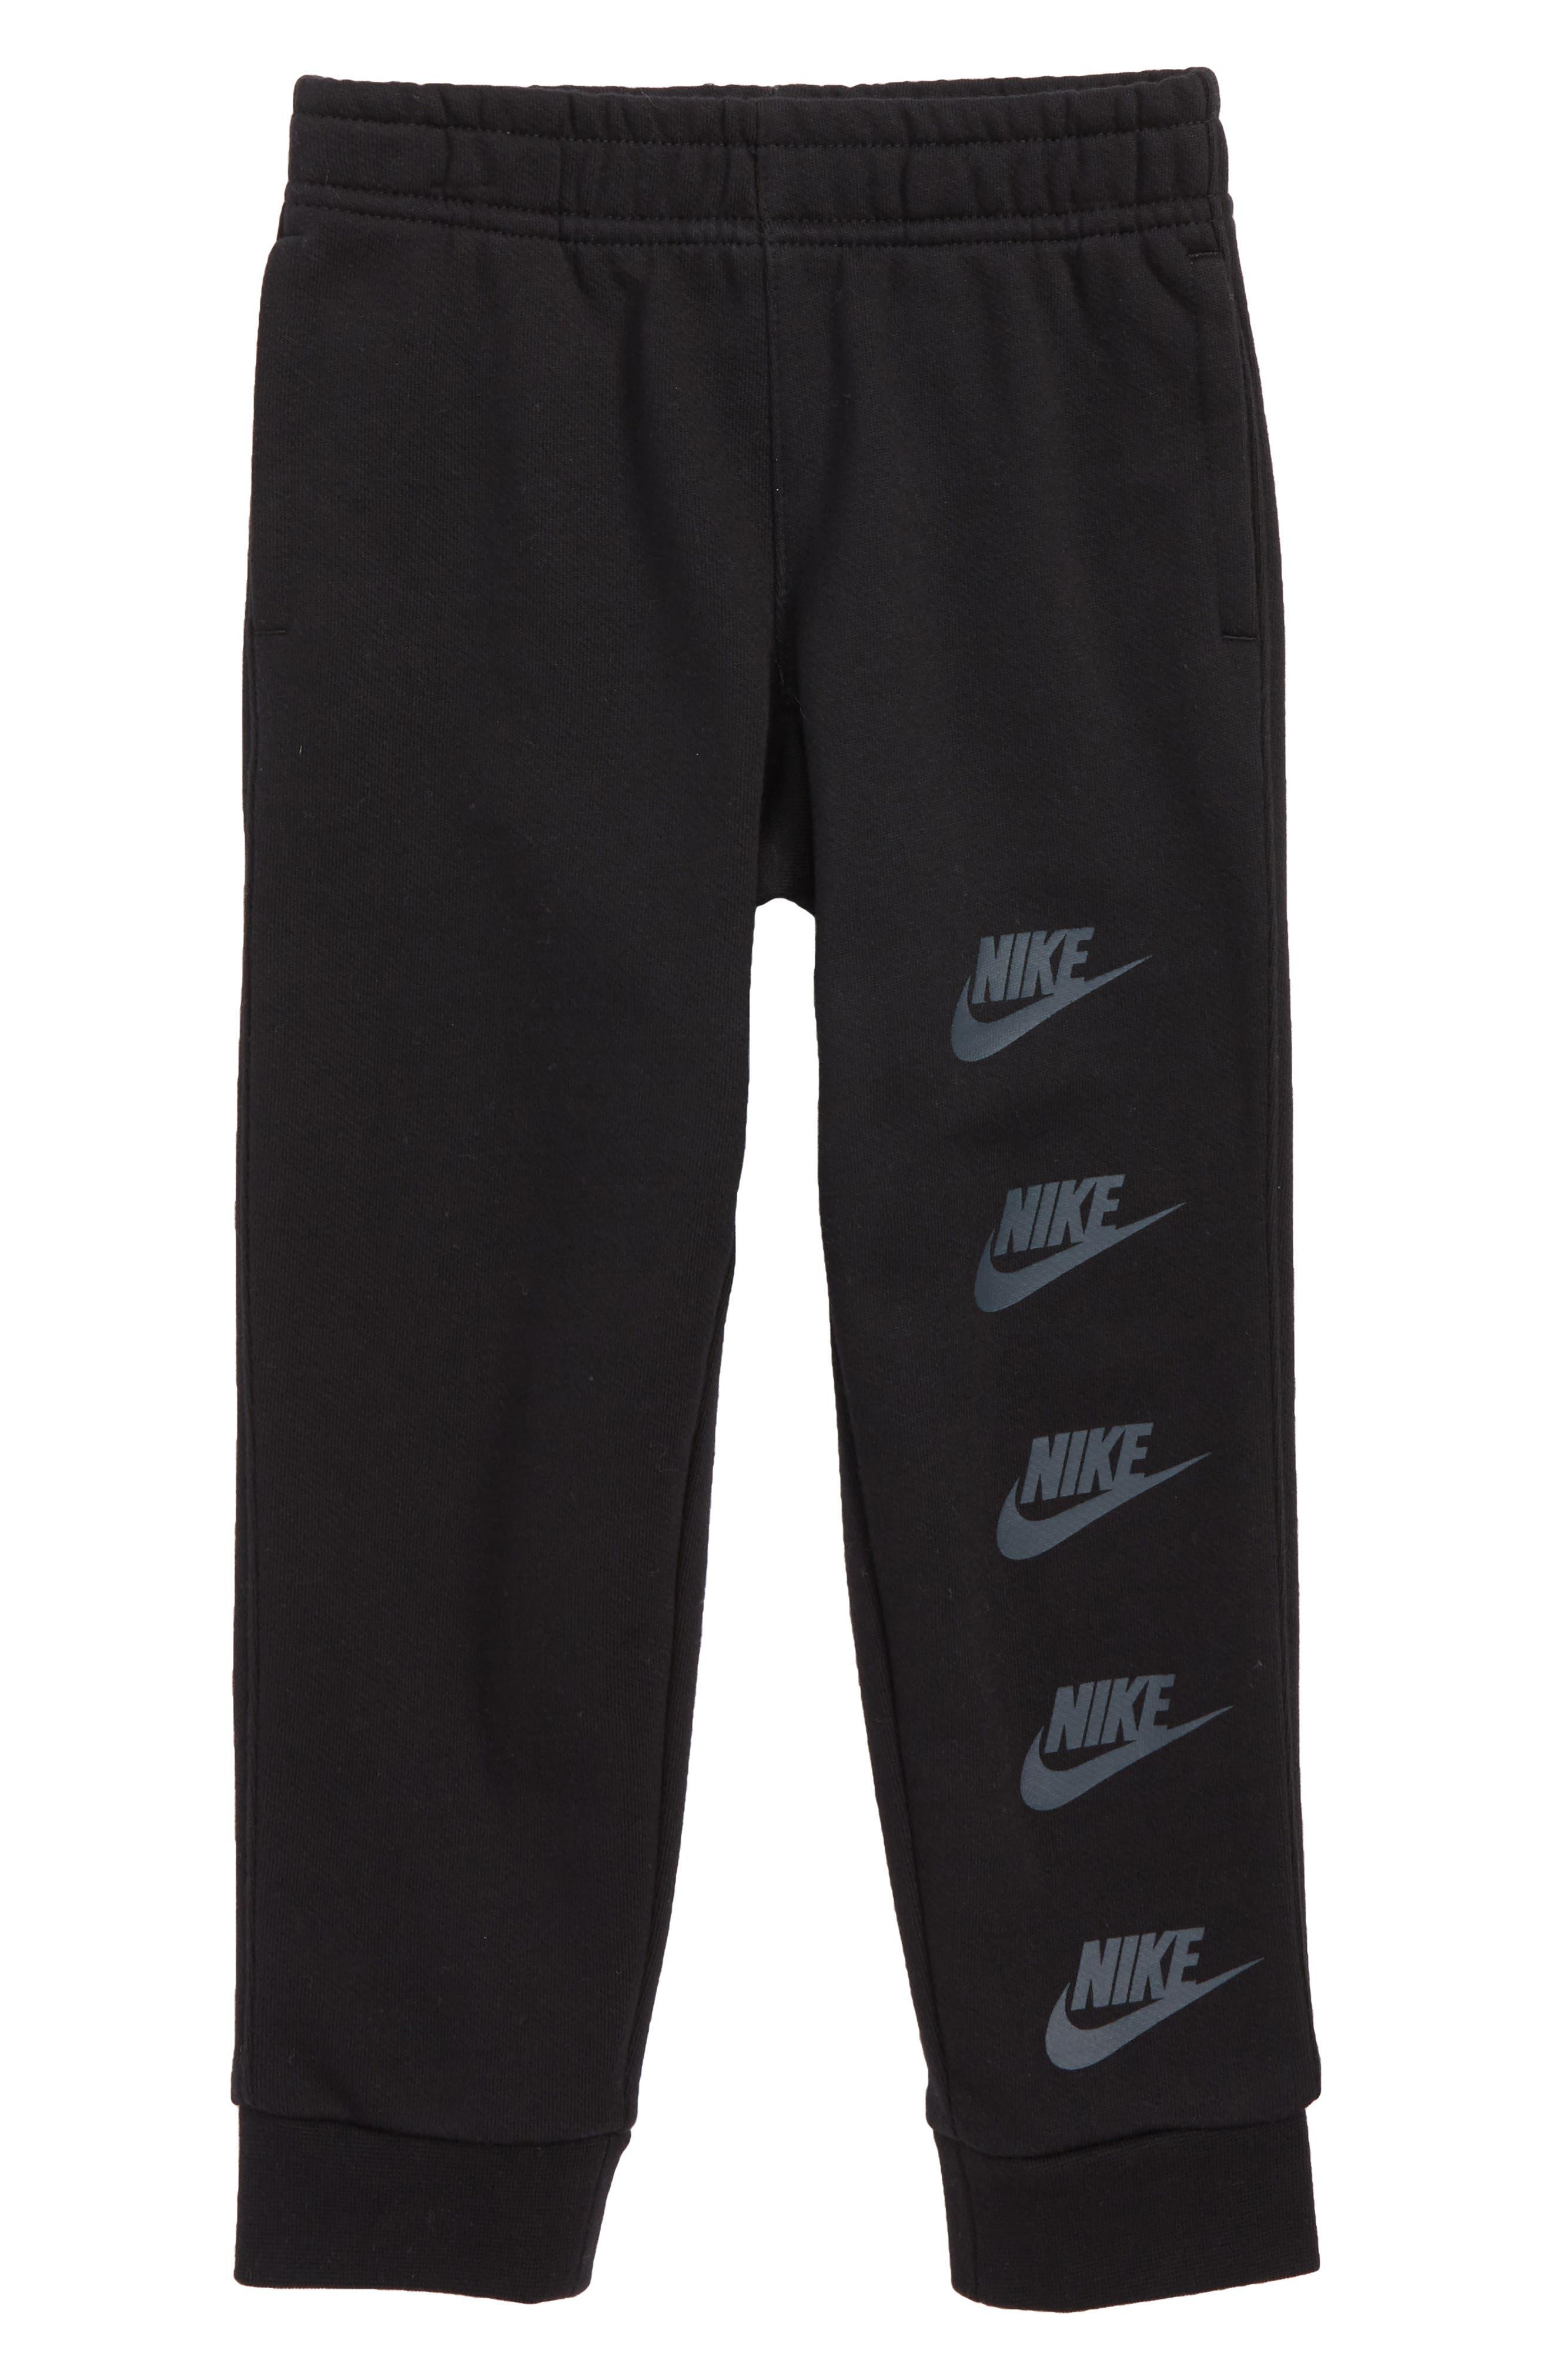 Sportswear Club Archive Sweatpants,                             Main thumbnail 1, color,                             BLACK